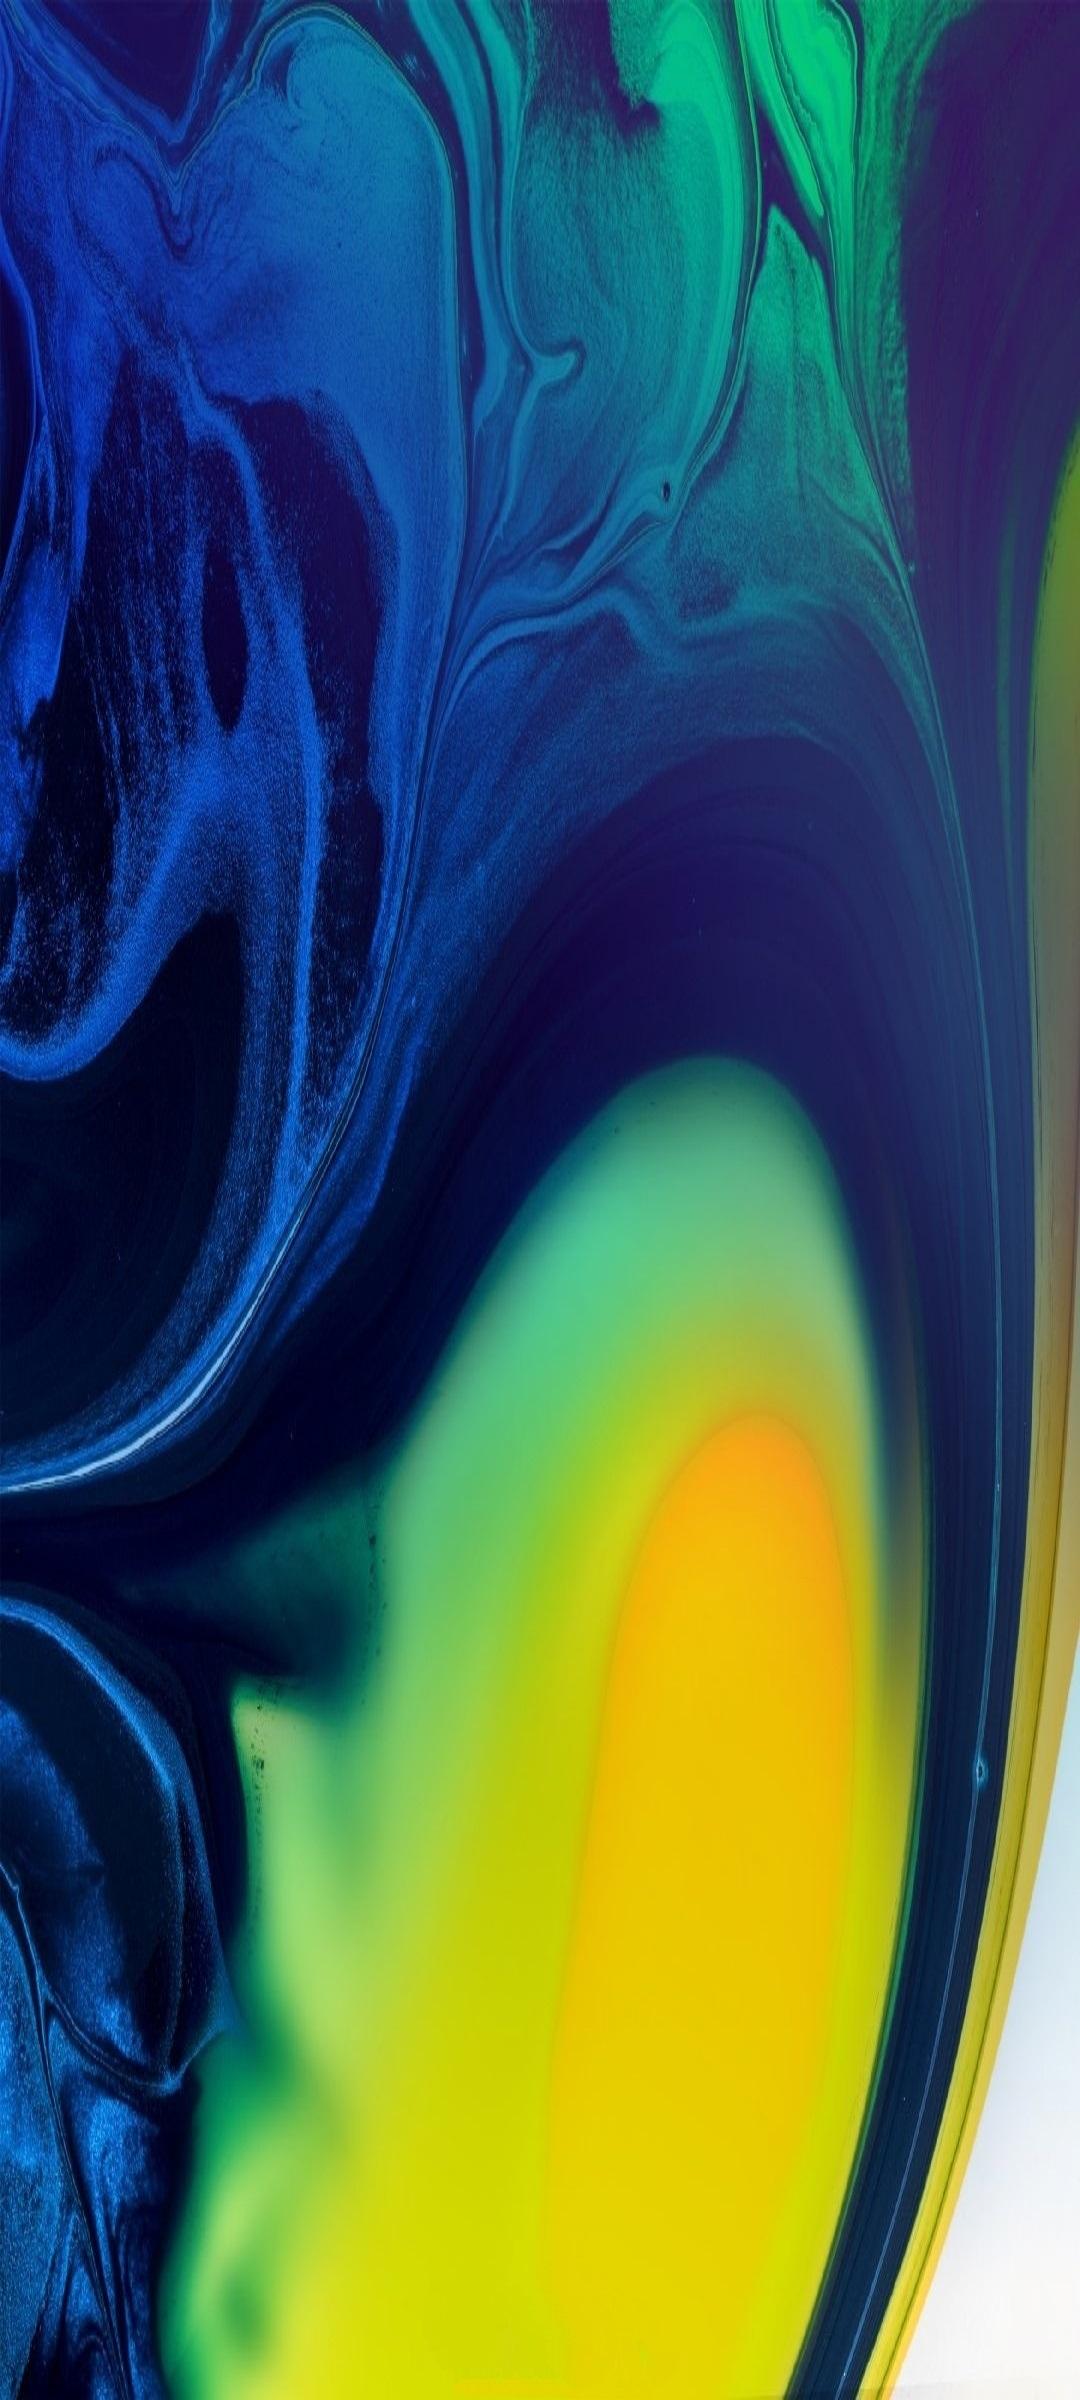 Samsung A80 Wallpaper Hd 1080x2400 Wallpaper Teahub Io